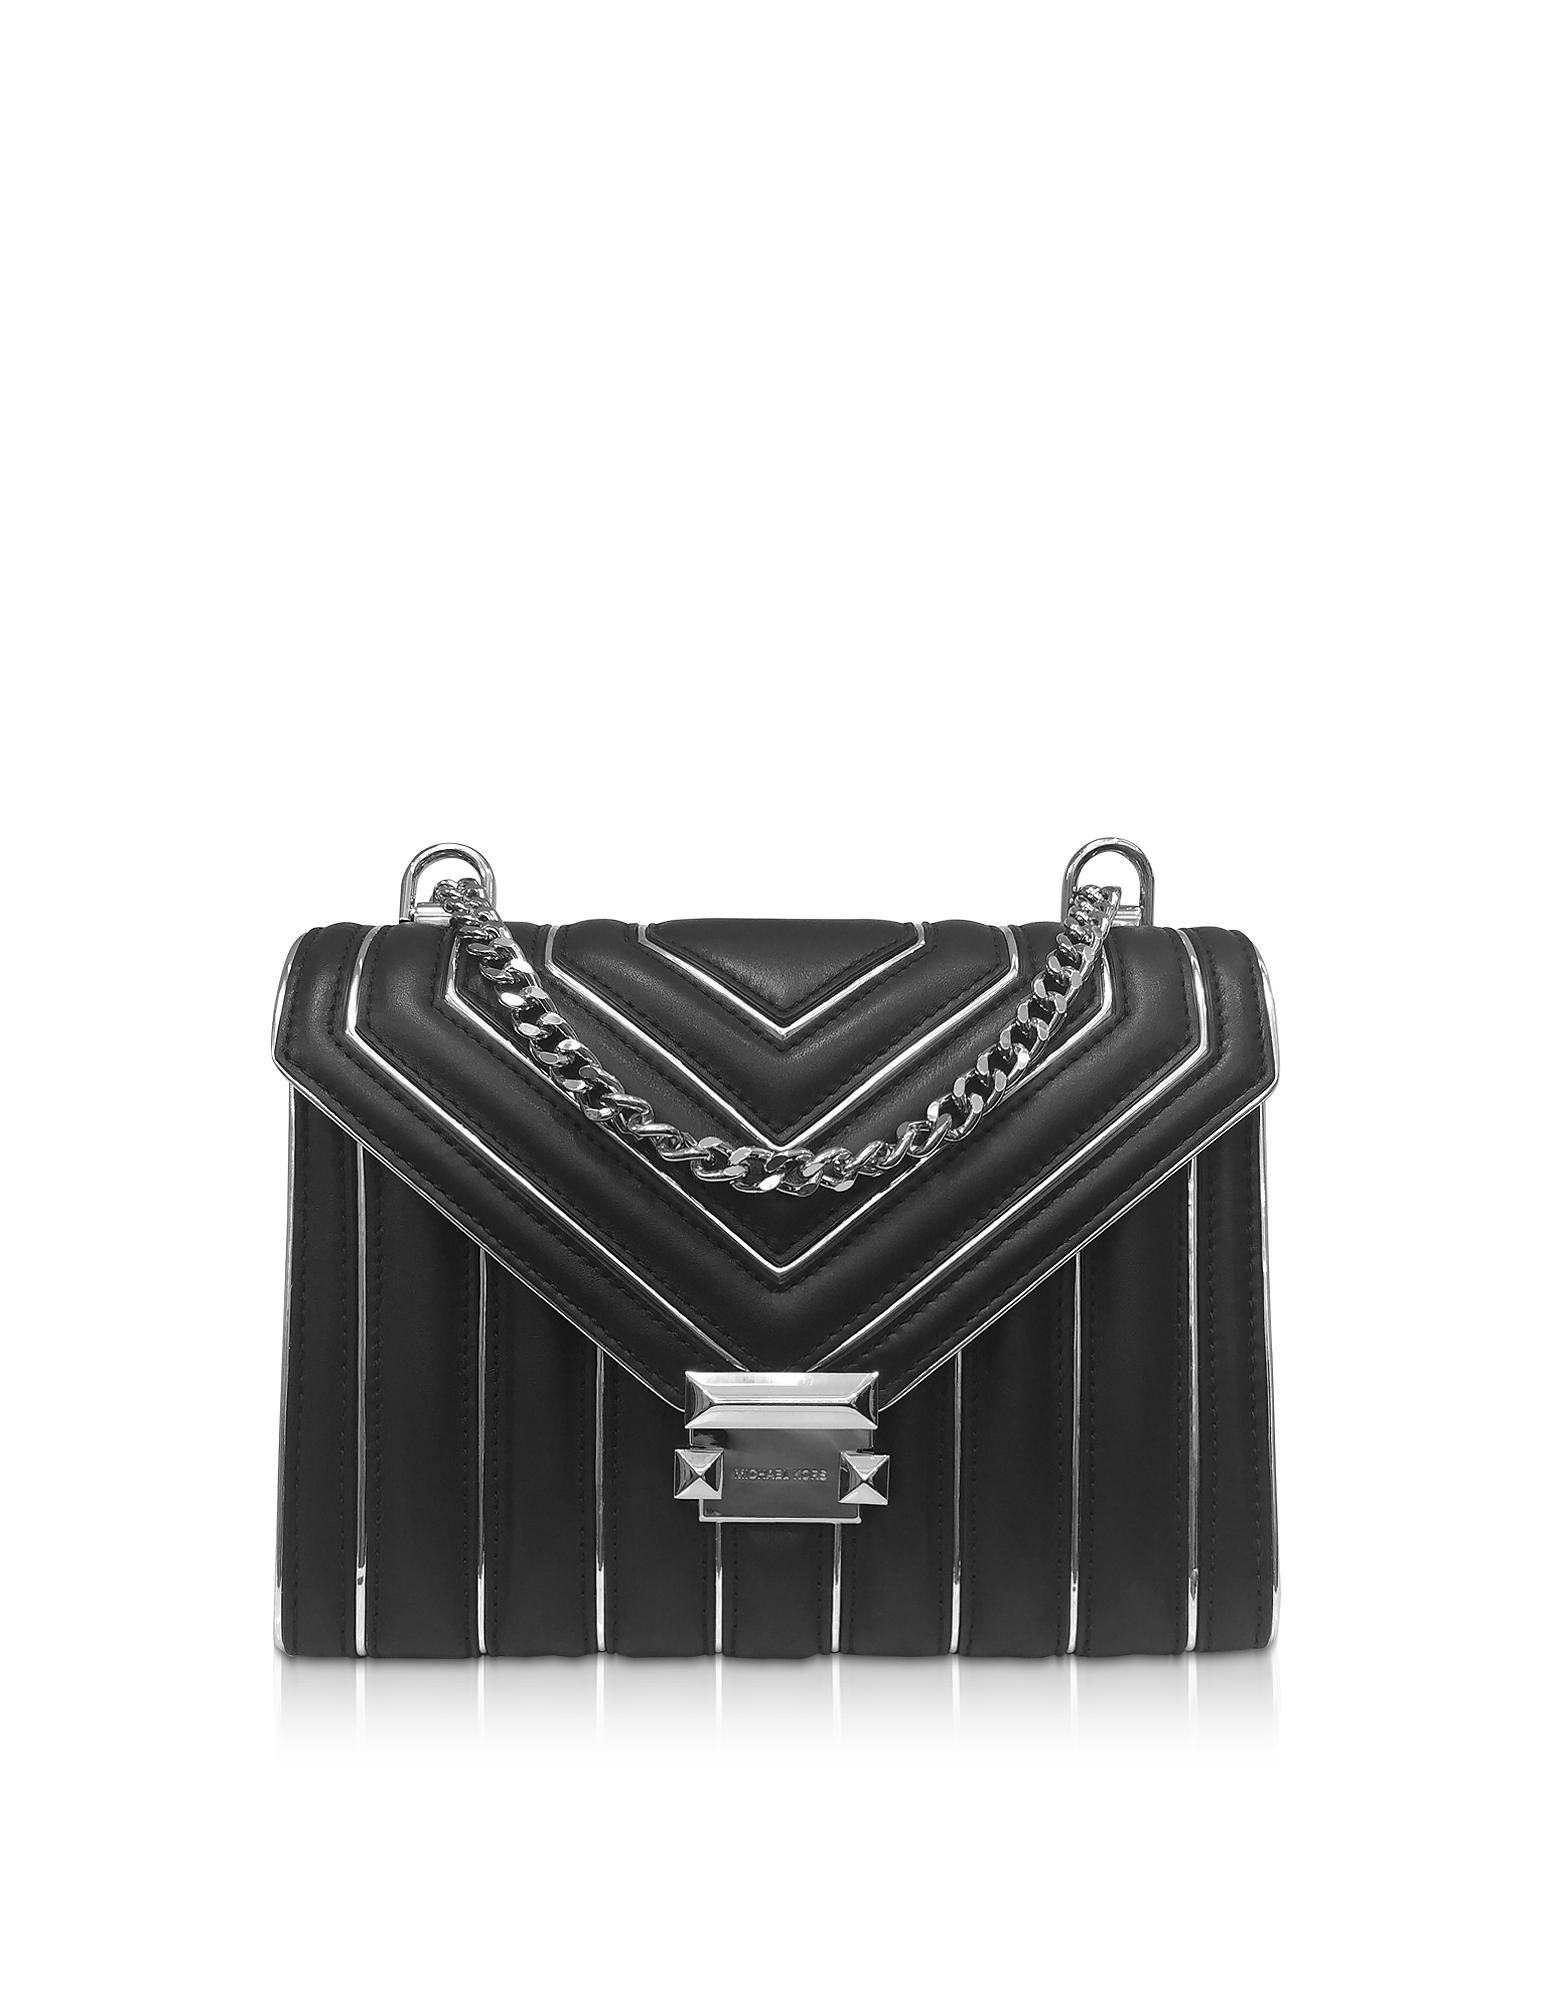 b5656e7d5da8 Michael Kors. Women's Black & Silver Whitney Large Quilted Leather Shoulder  Bag